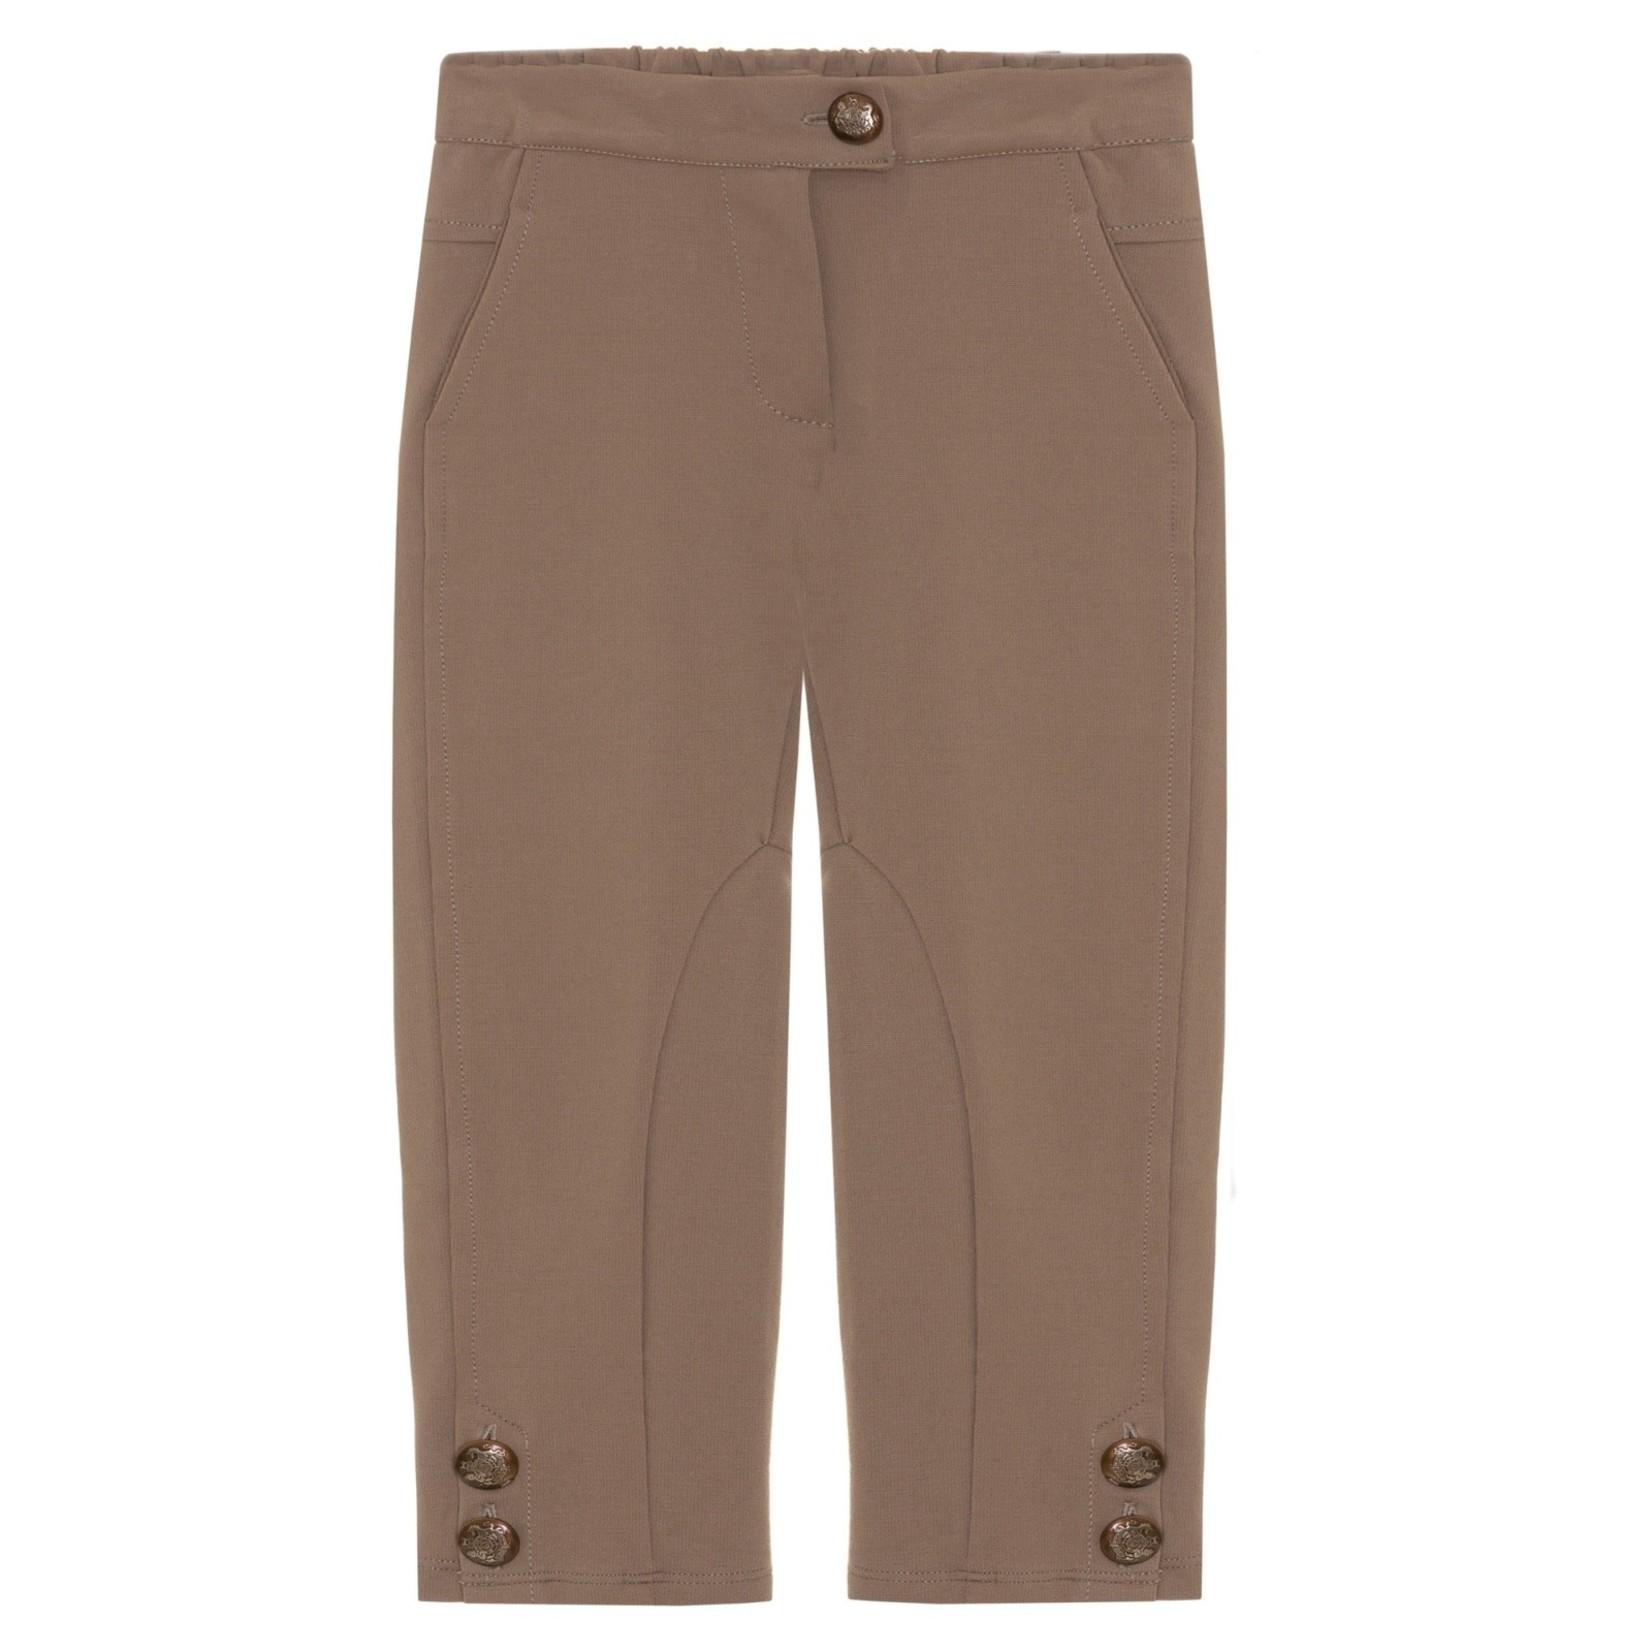 Pants Camel - Patachou